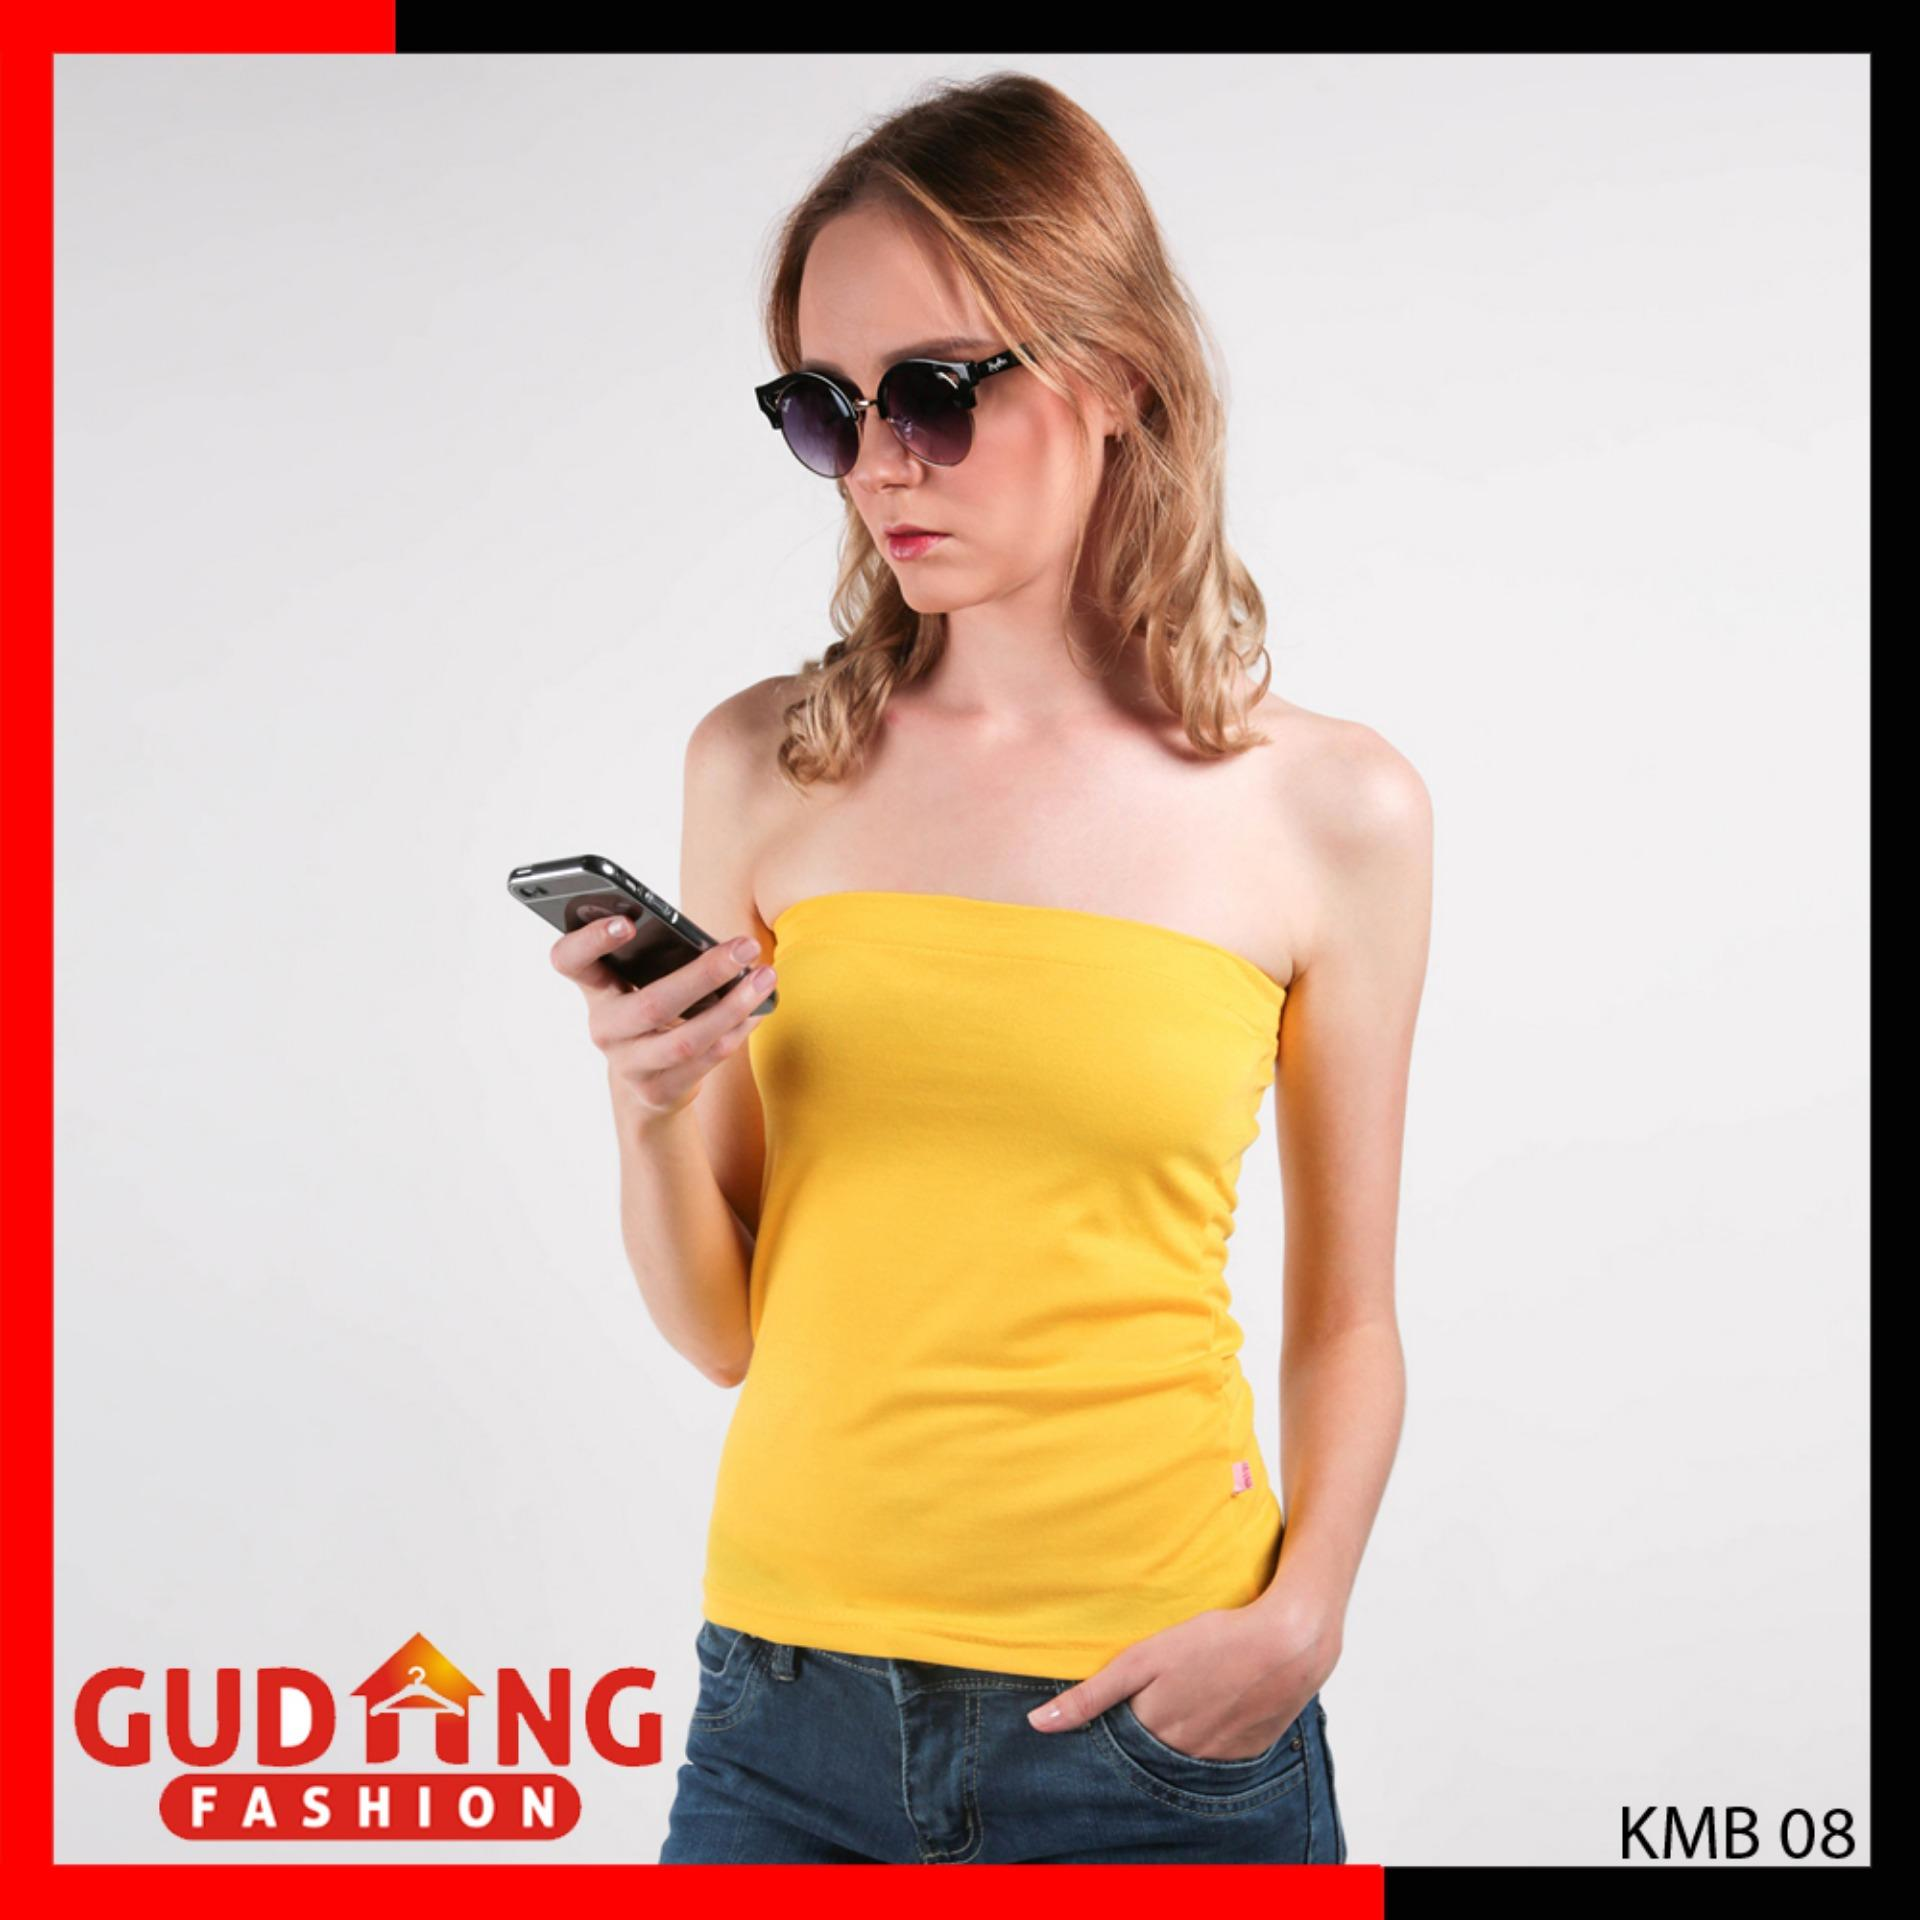 Gudang Fashion - Baju Wanita Kemben Modis - Putih  b0560cd305